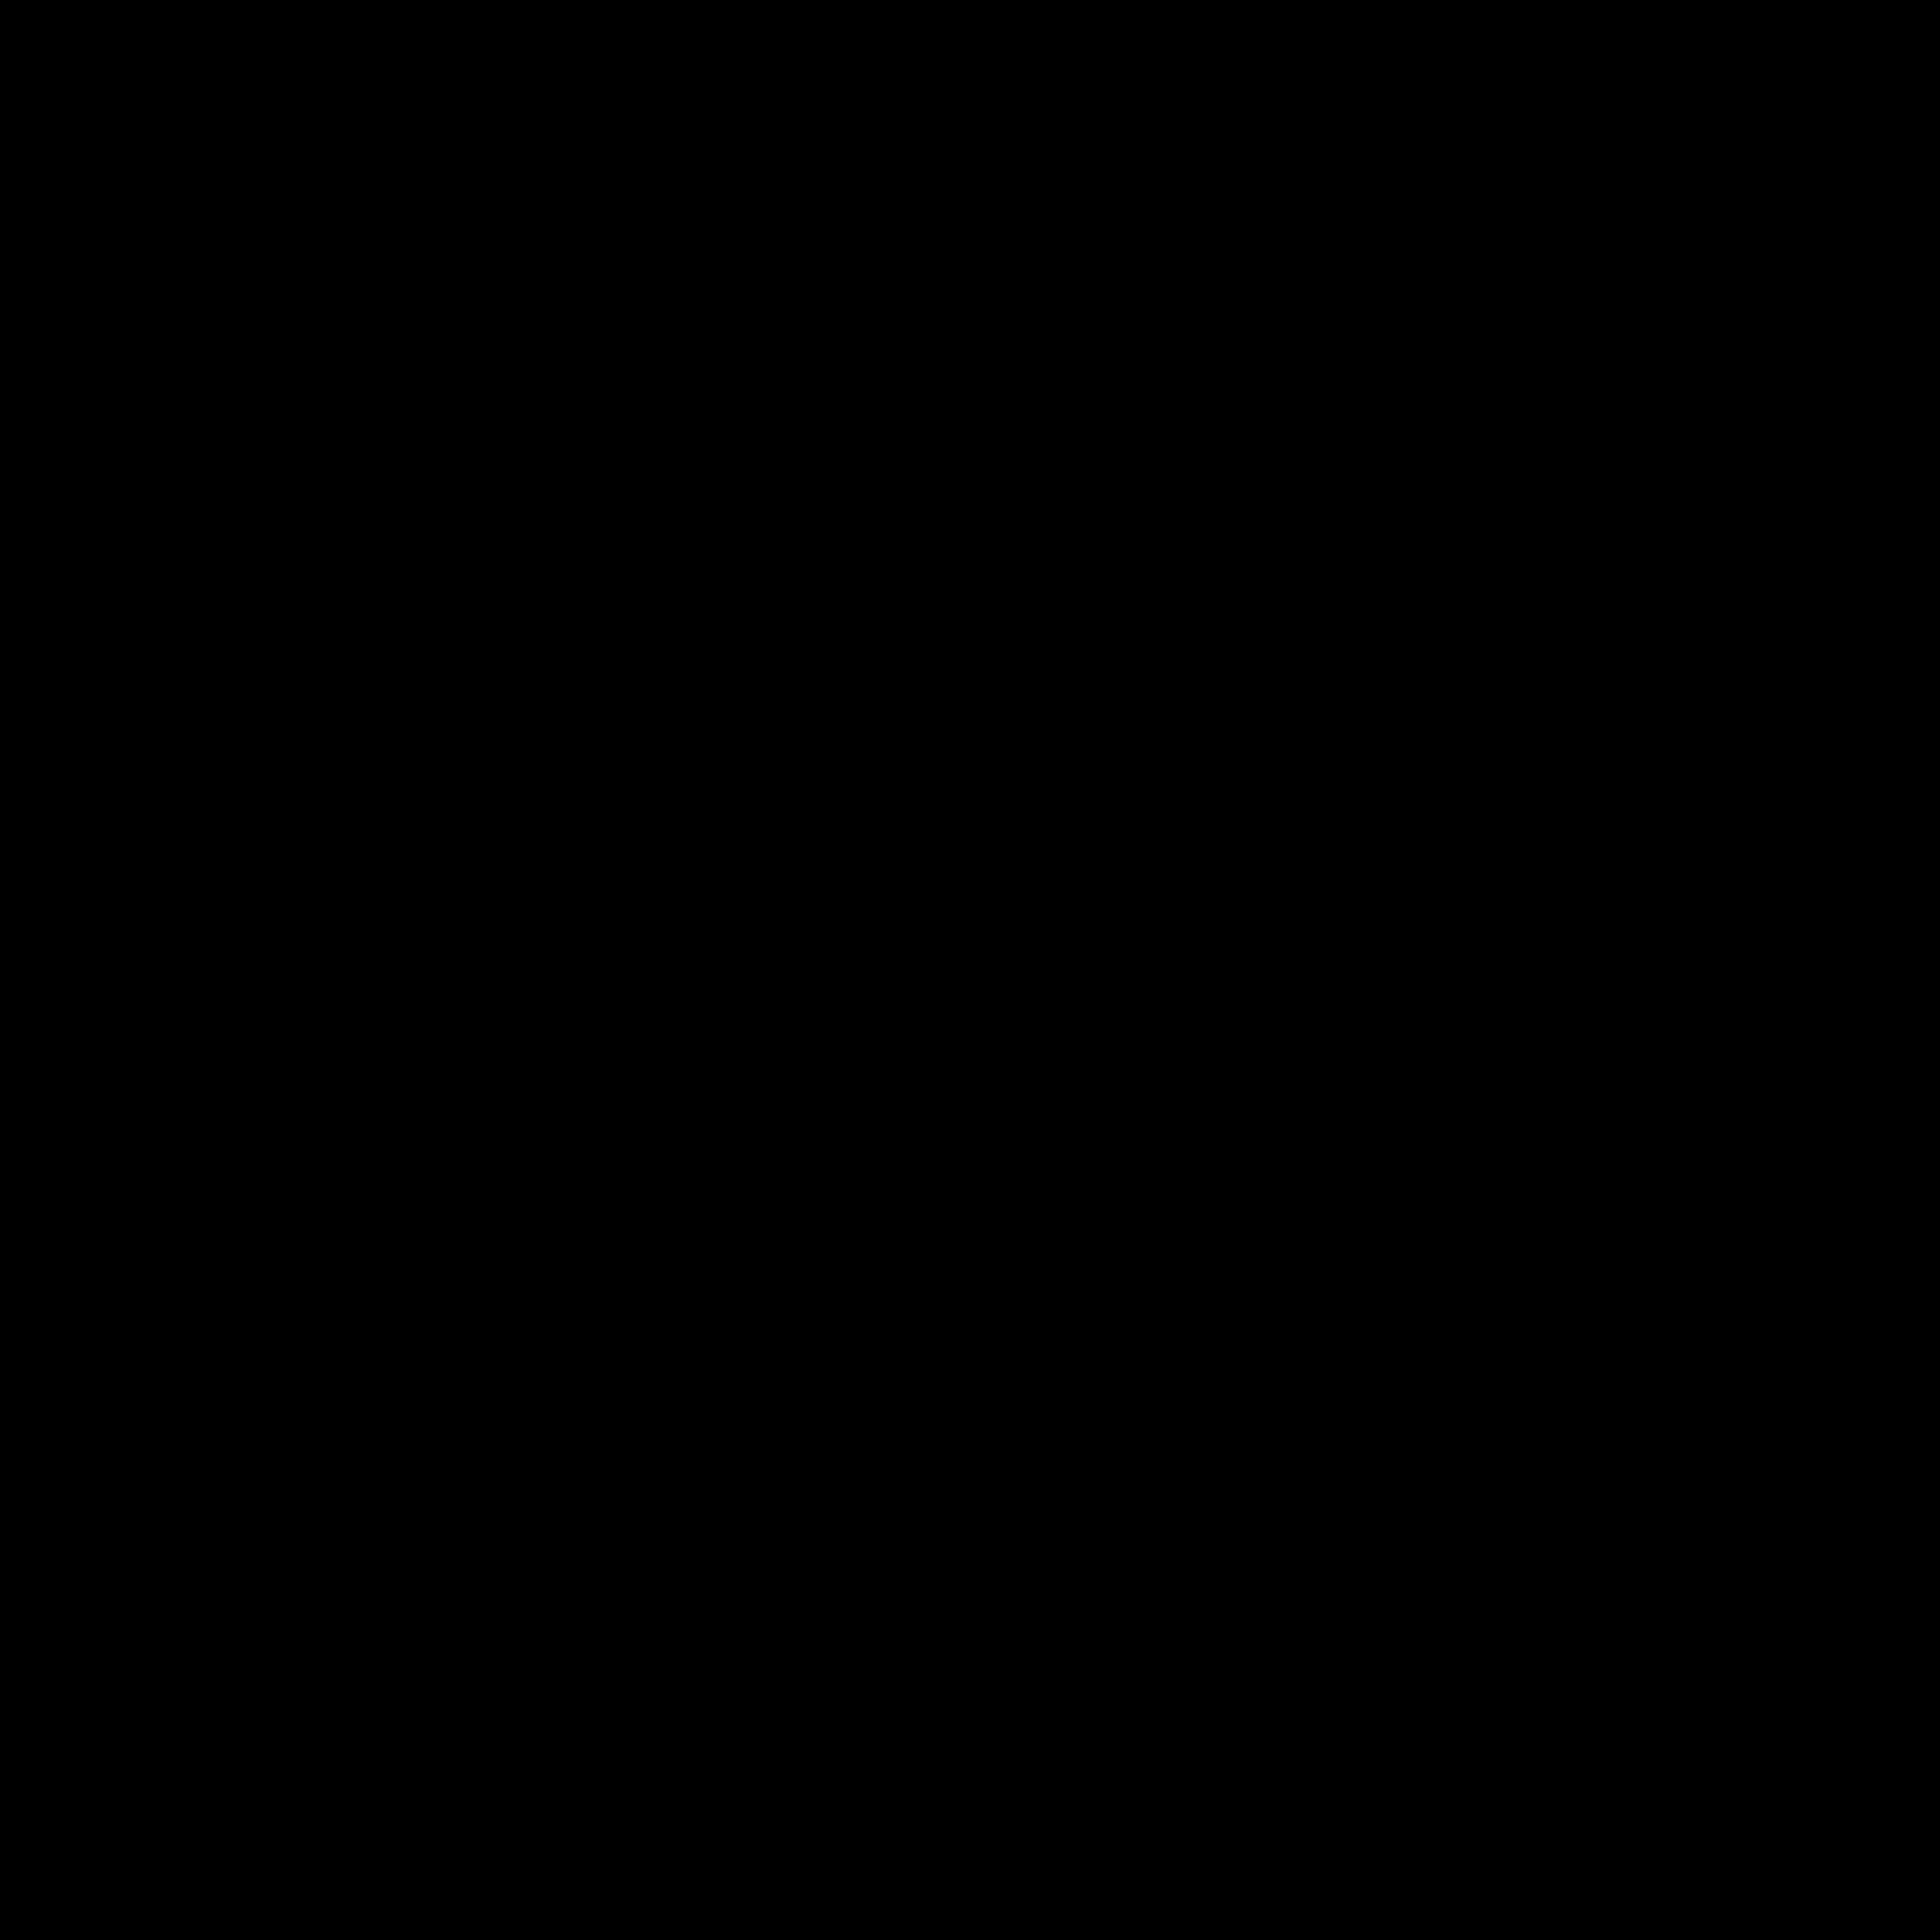 Accolade Logo PNG Transparent & SVG Vector.